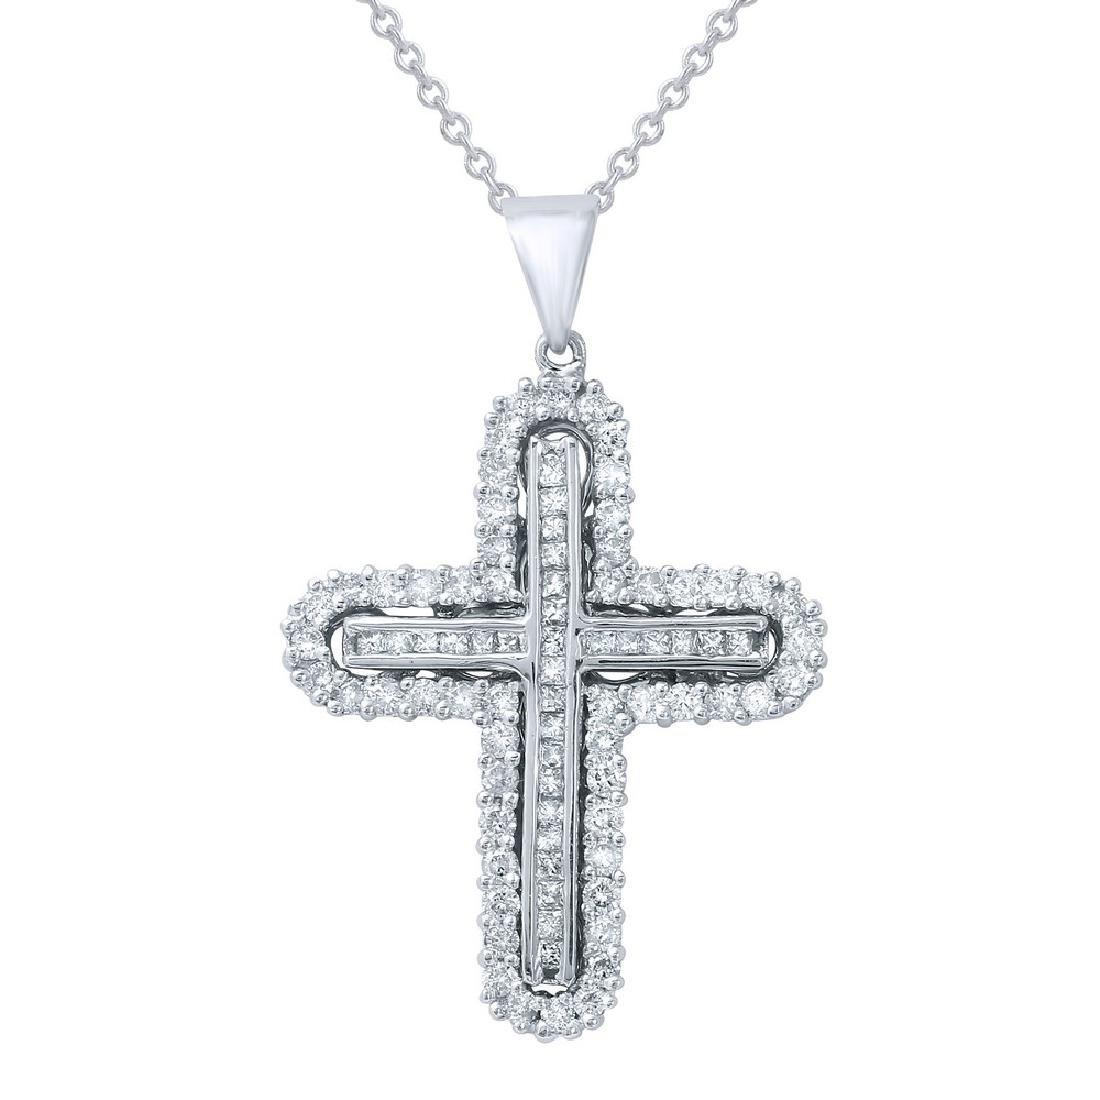 Genuine 0.9 TCW 14K White Gold Ladies Necklace